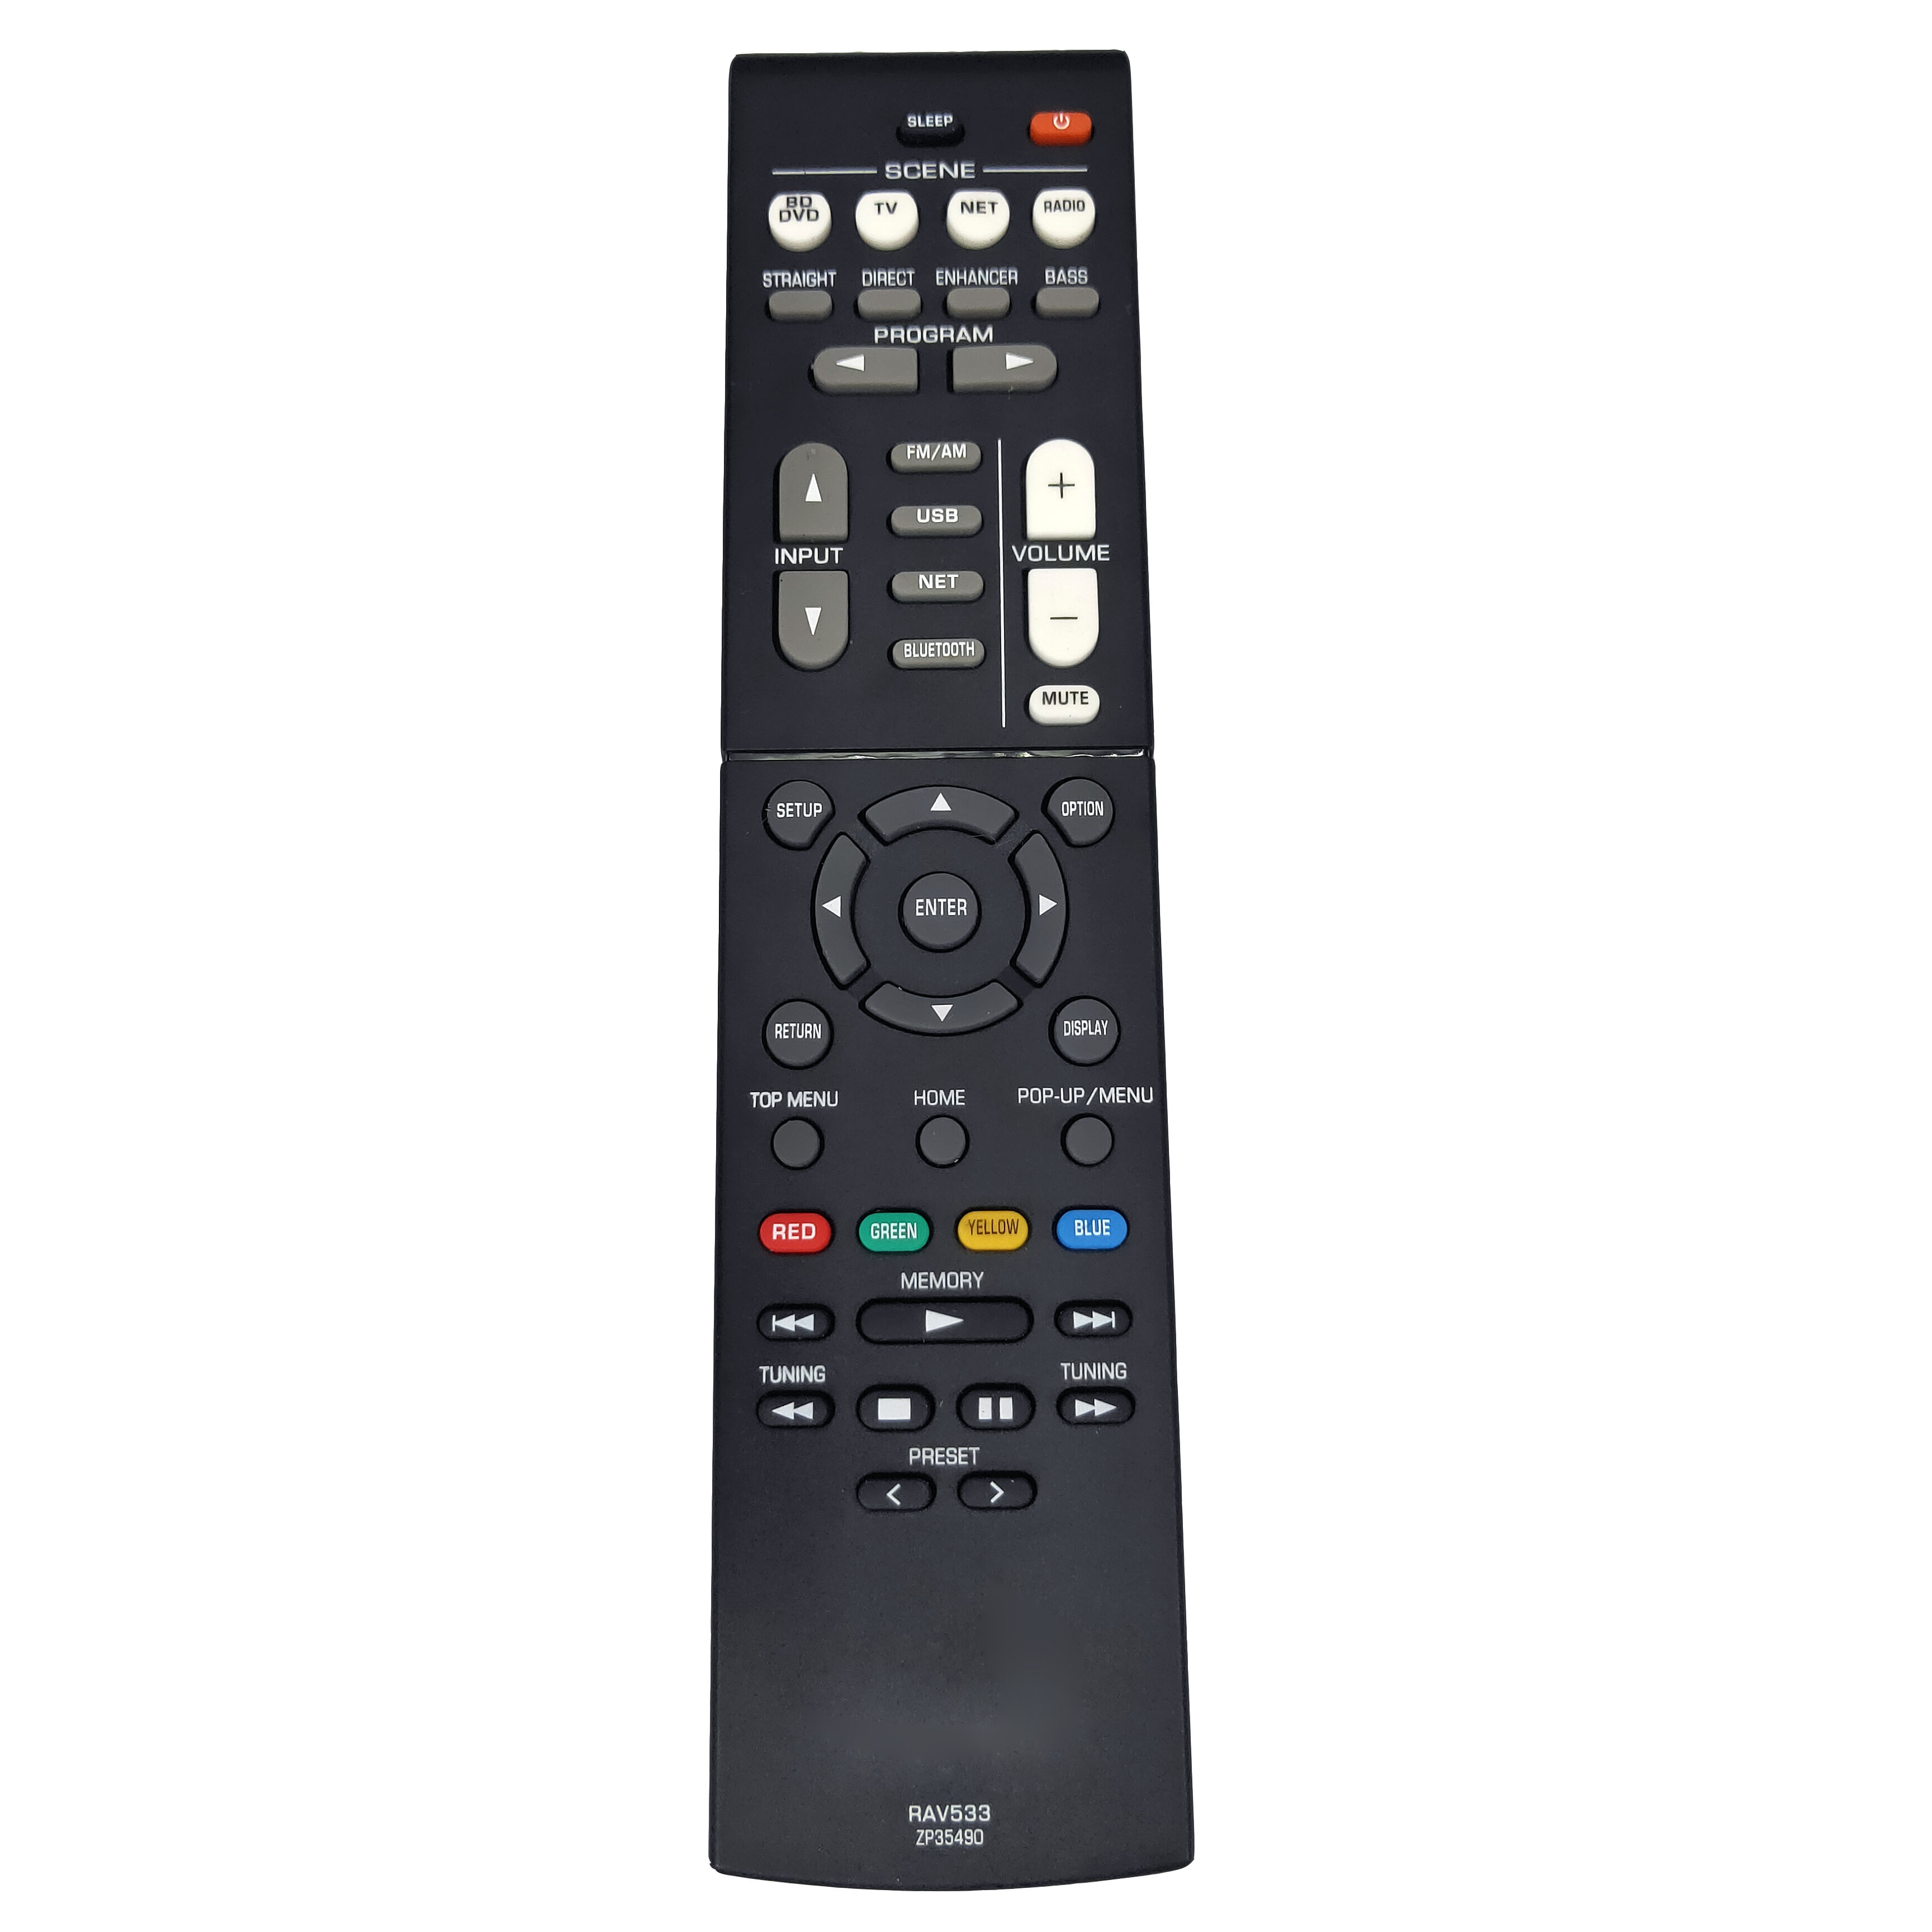 NEW RAV533 ZP35490 Remote for YAMAHA RAV533 EX RX-V4 RAV531 RX-V479 rx-v479bl RX-V579 rx-v579bl AV Receiver Fernbedienung